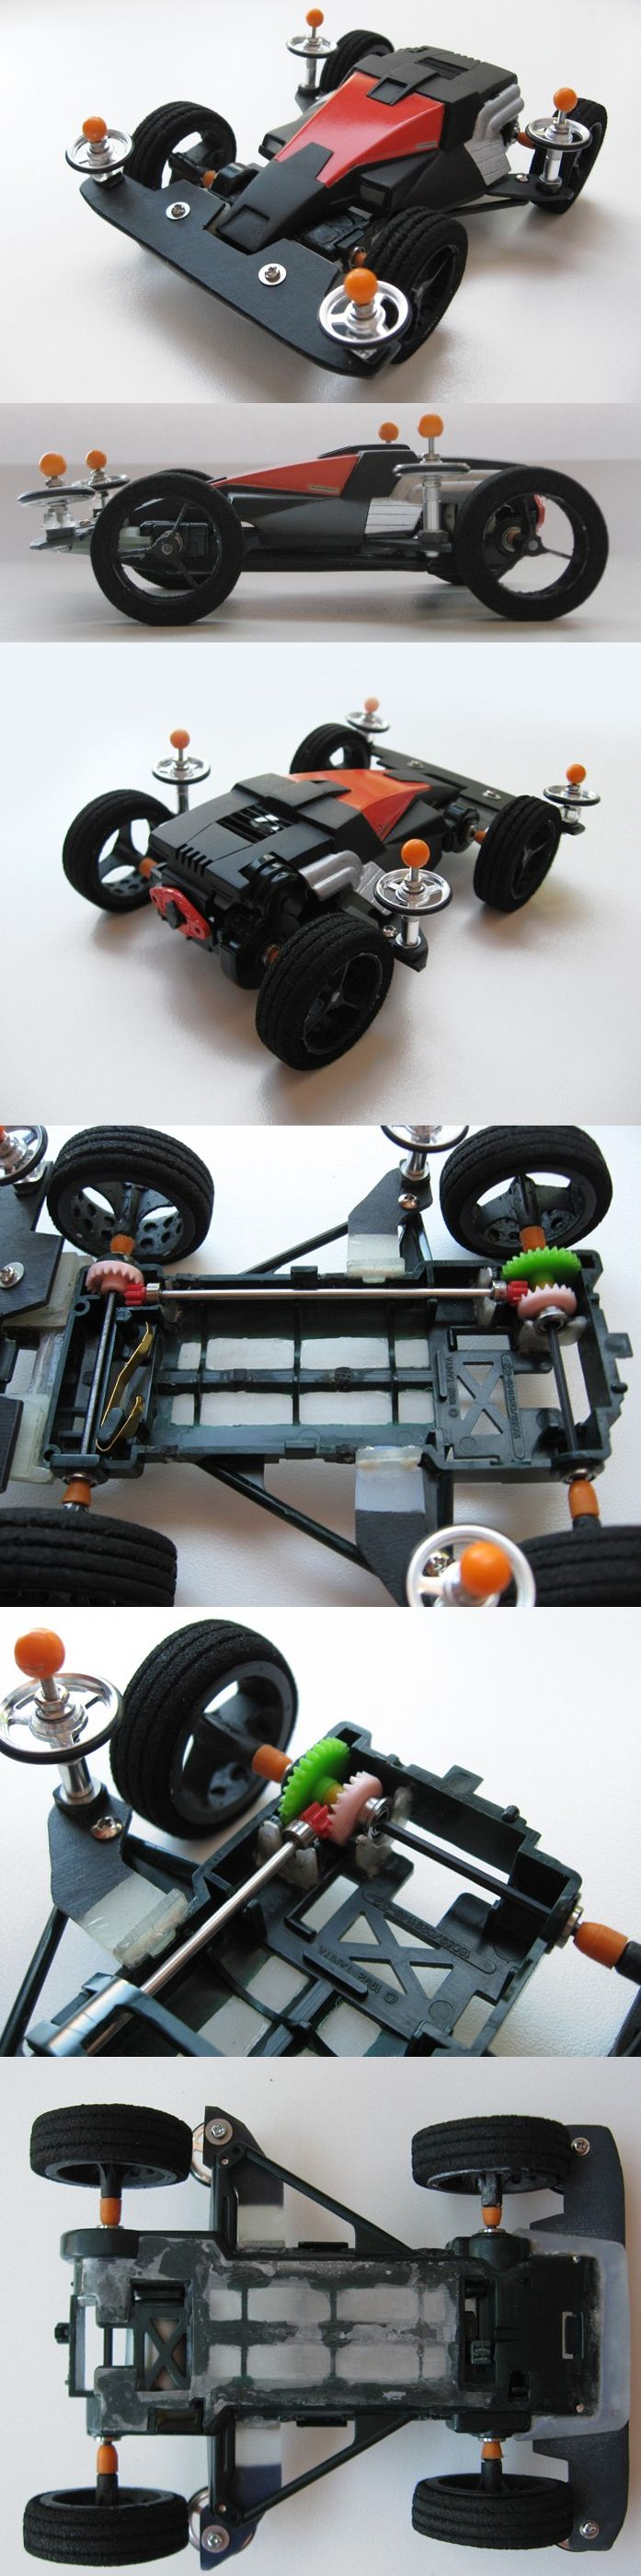 Dash X1 Proto Emperor, Mini 4WD Street by Aran | Mini 4WD | #Mini4WD | #Tamiya | #ミニ四駆